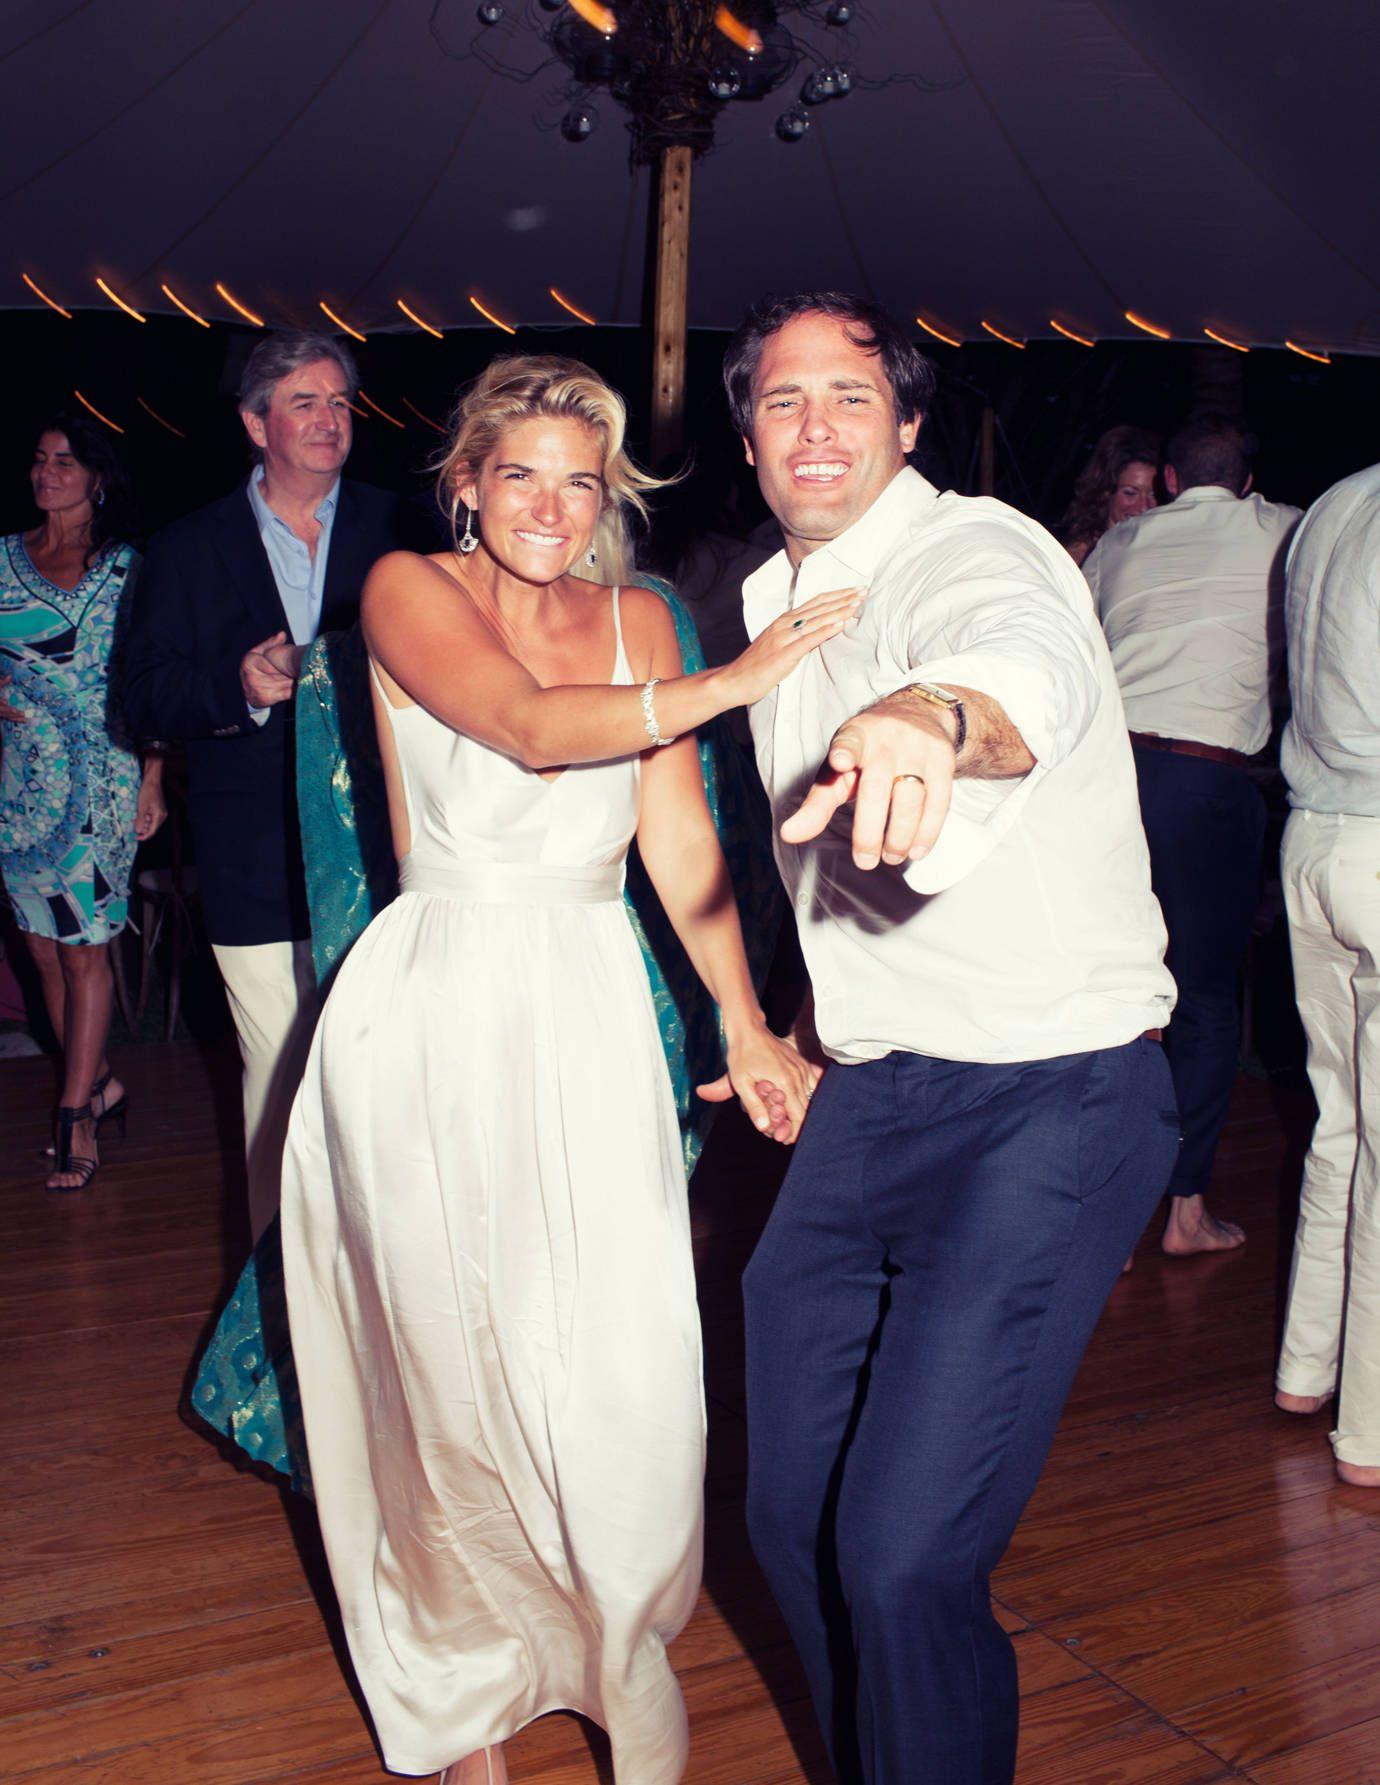 Liza Pulitzer Palm Beach Wedding Ivey Day And Bobby Leidy